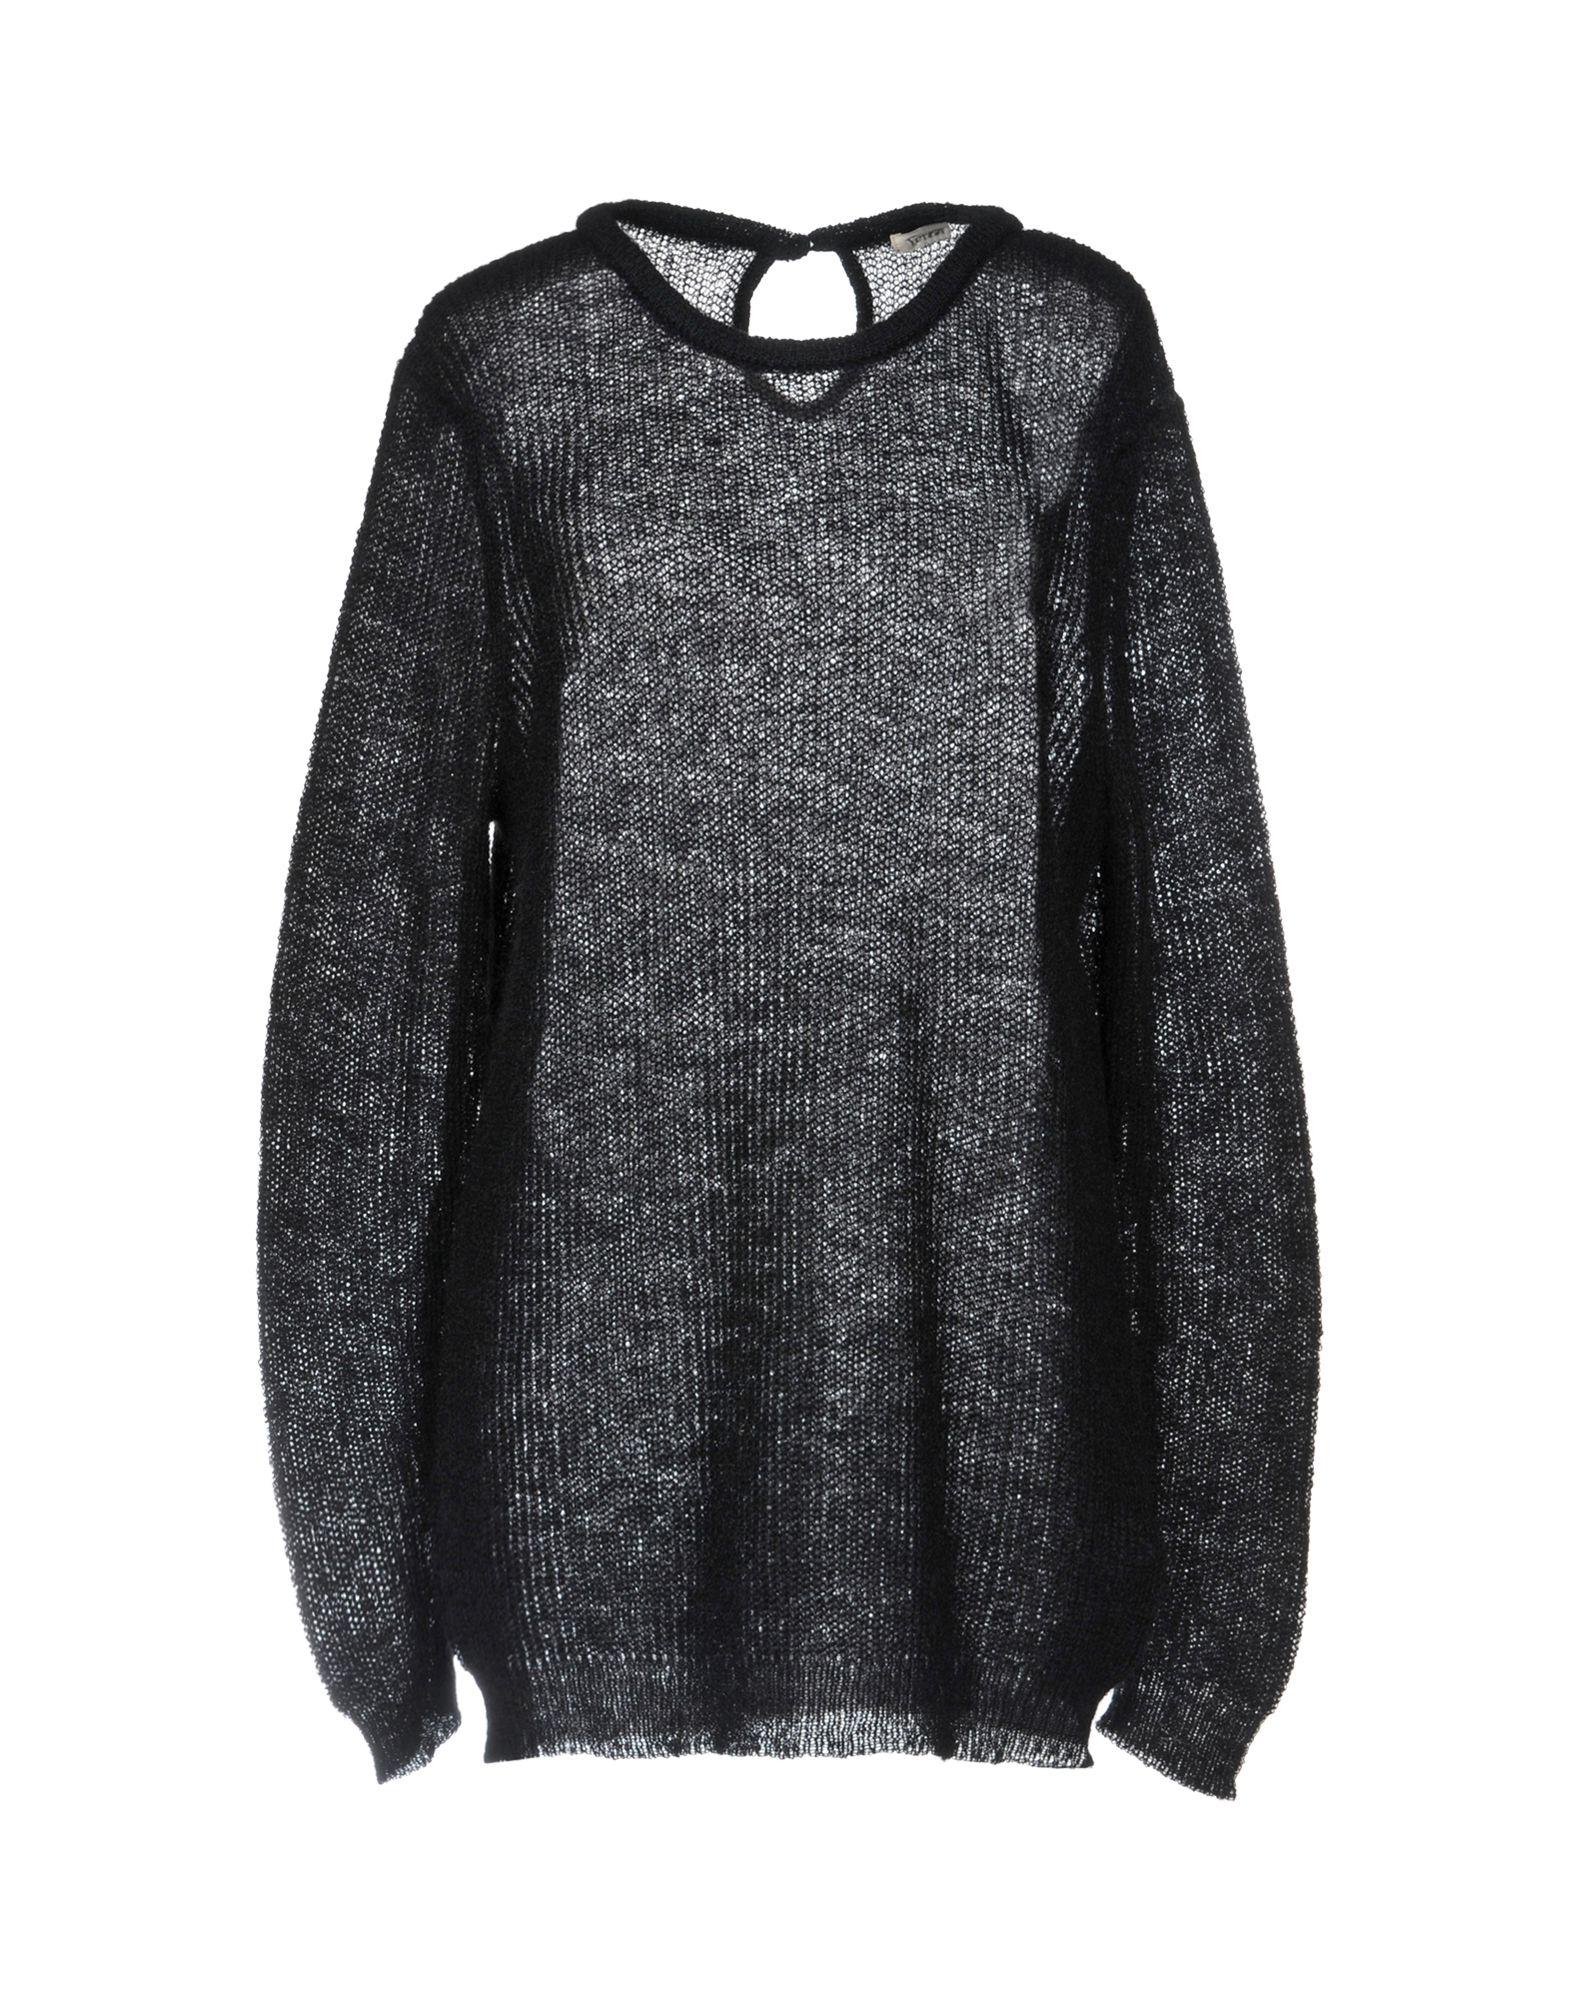 YERSE Sweater in Black